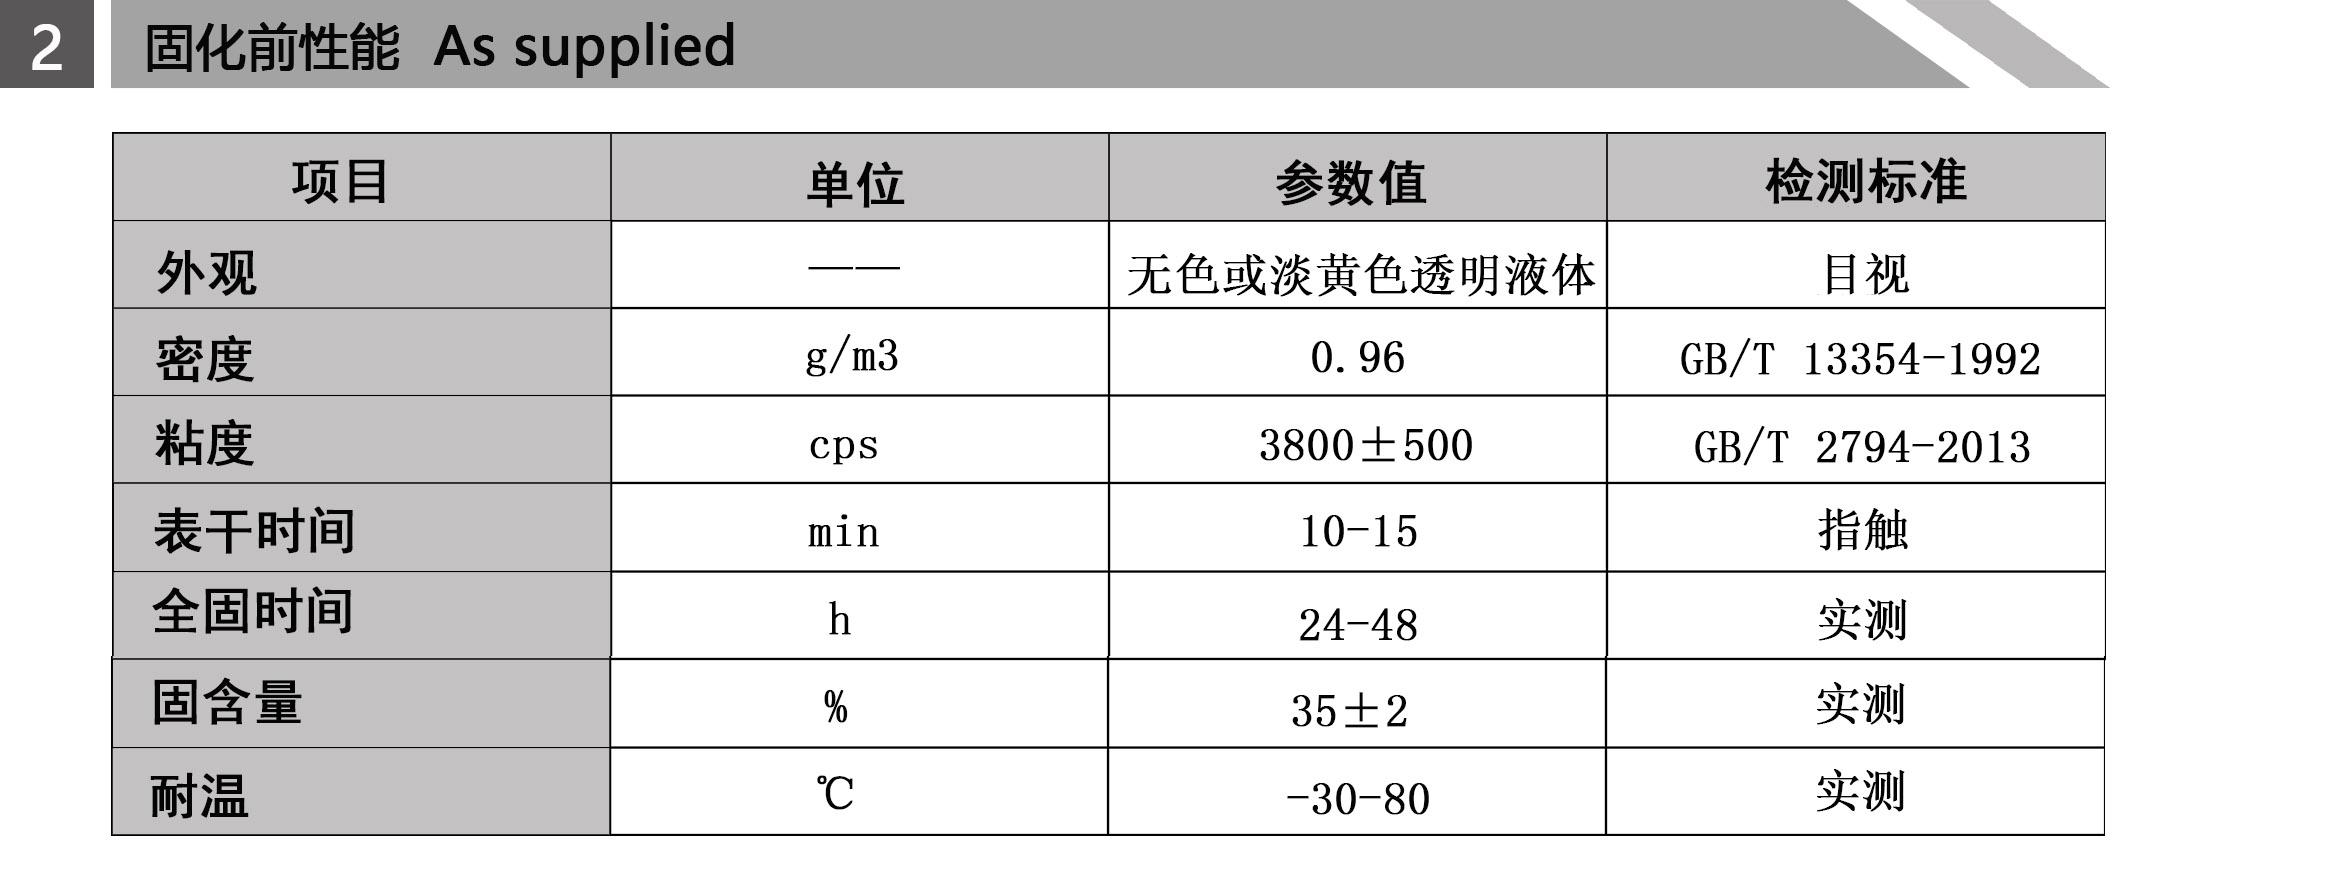 PP聚丙烯胶水,专粘PP聚丙烯的胶水